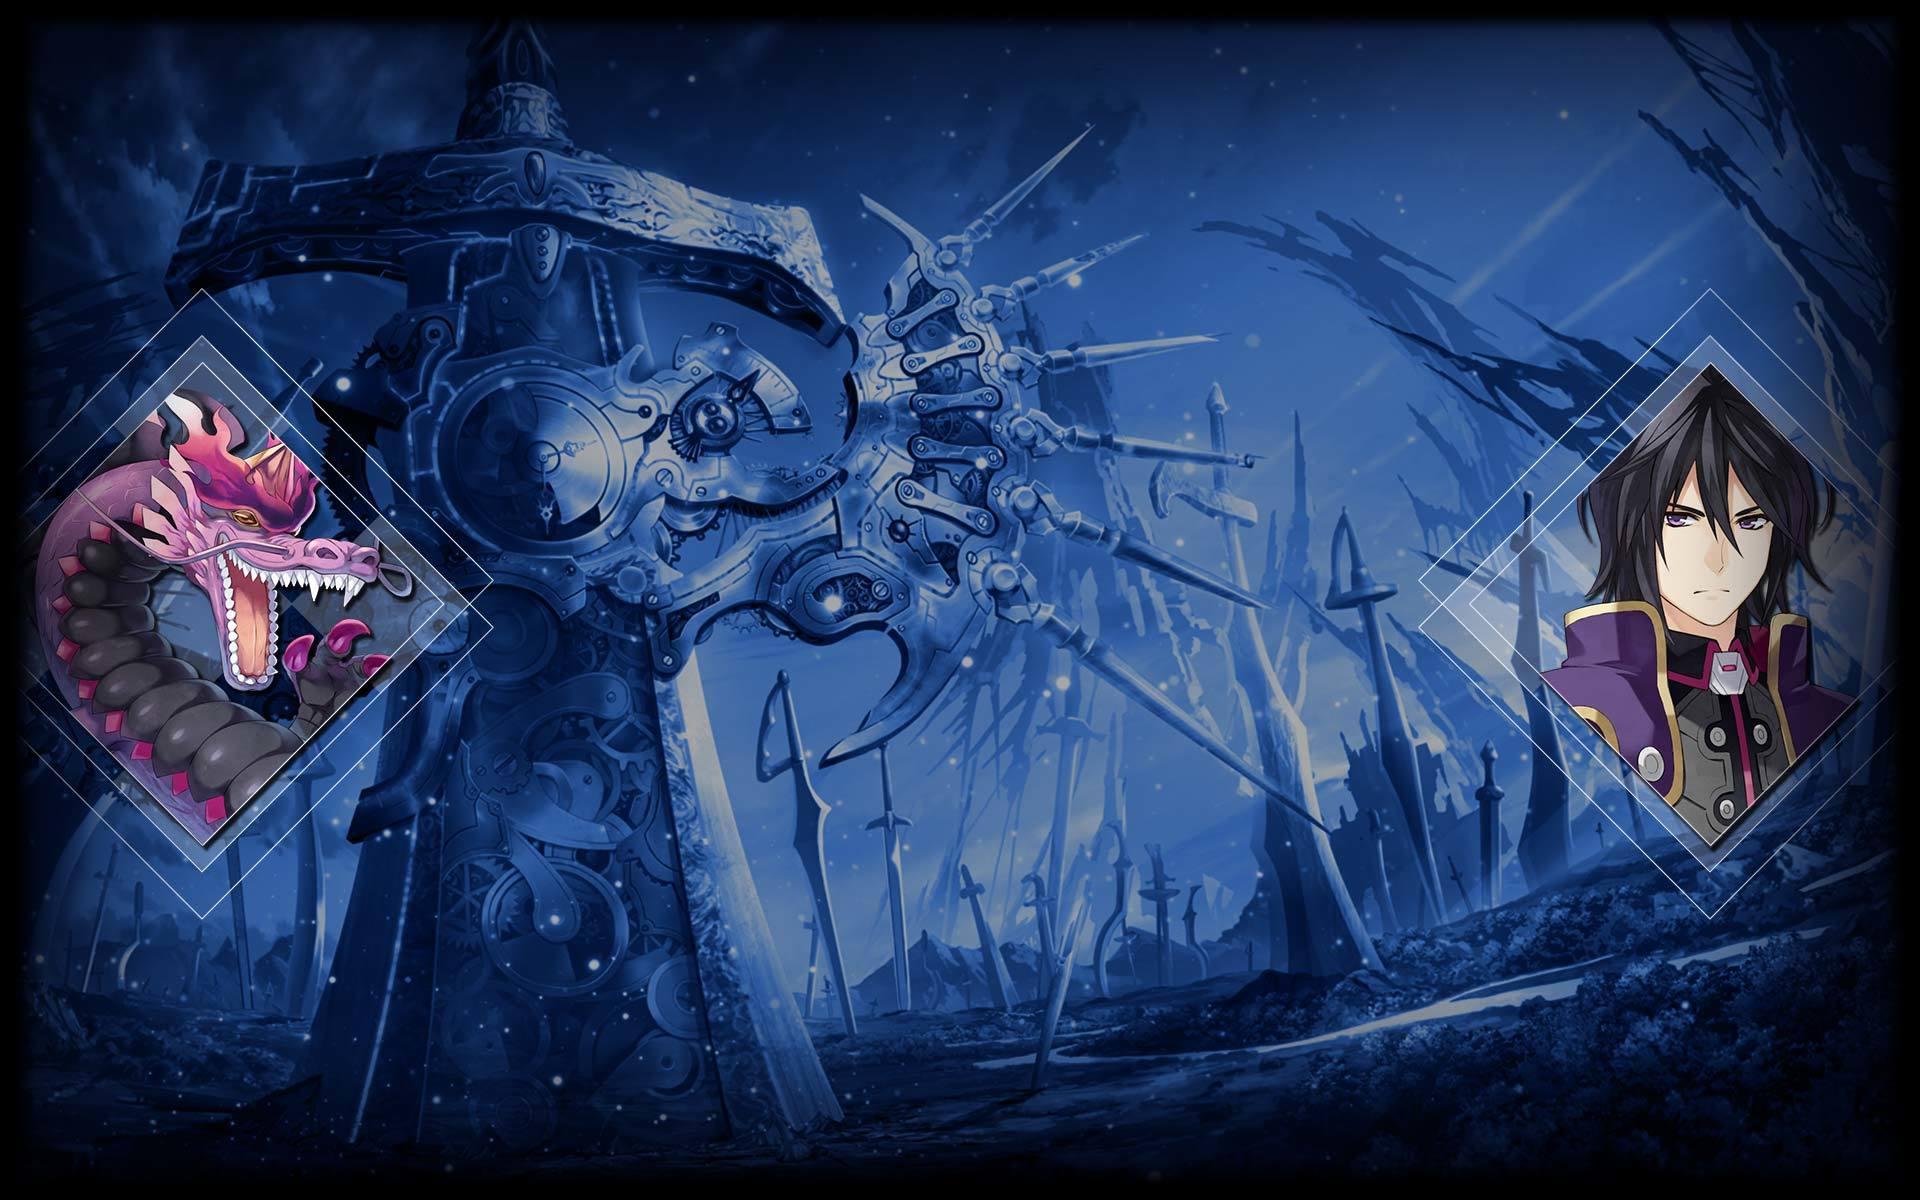 Fairy Fencer F: Advent Dark Force Wallpaper 008 - Apollonius and Seguro